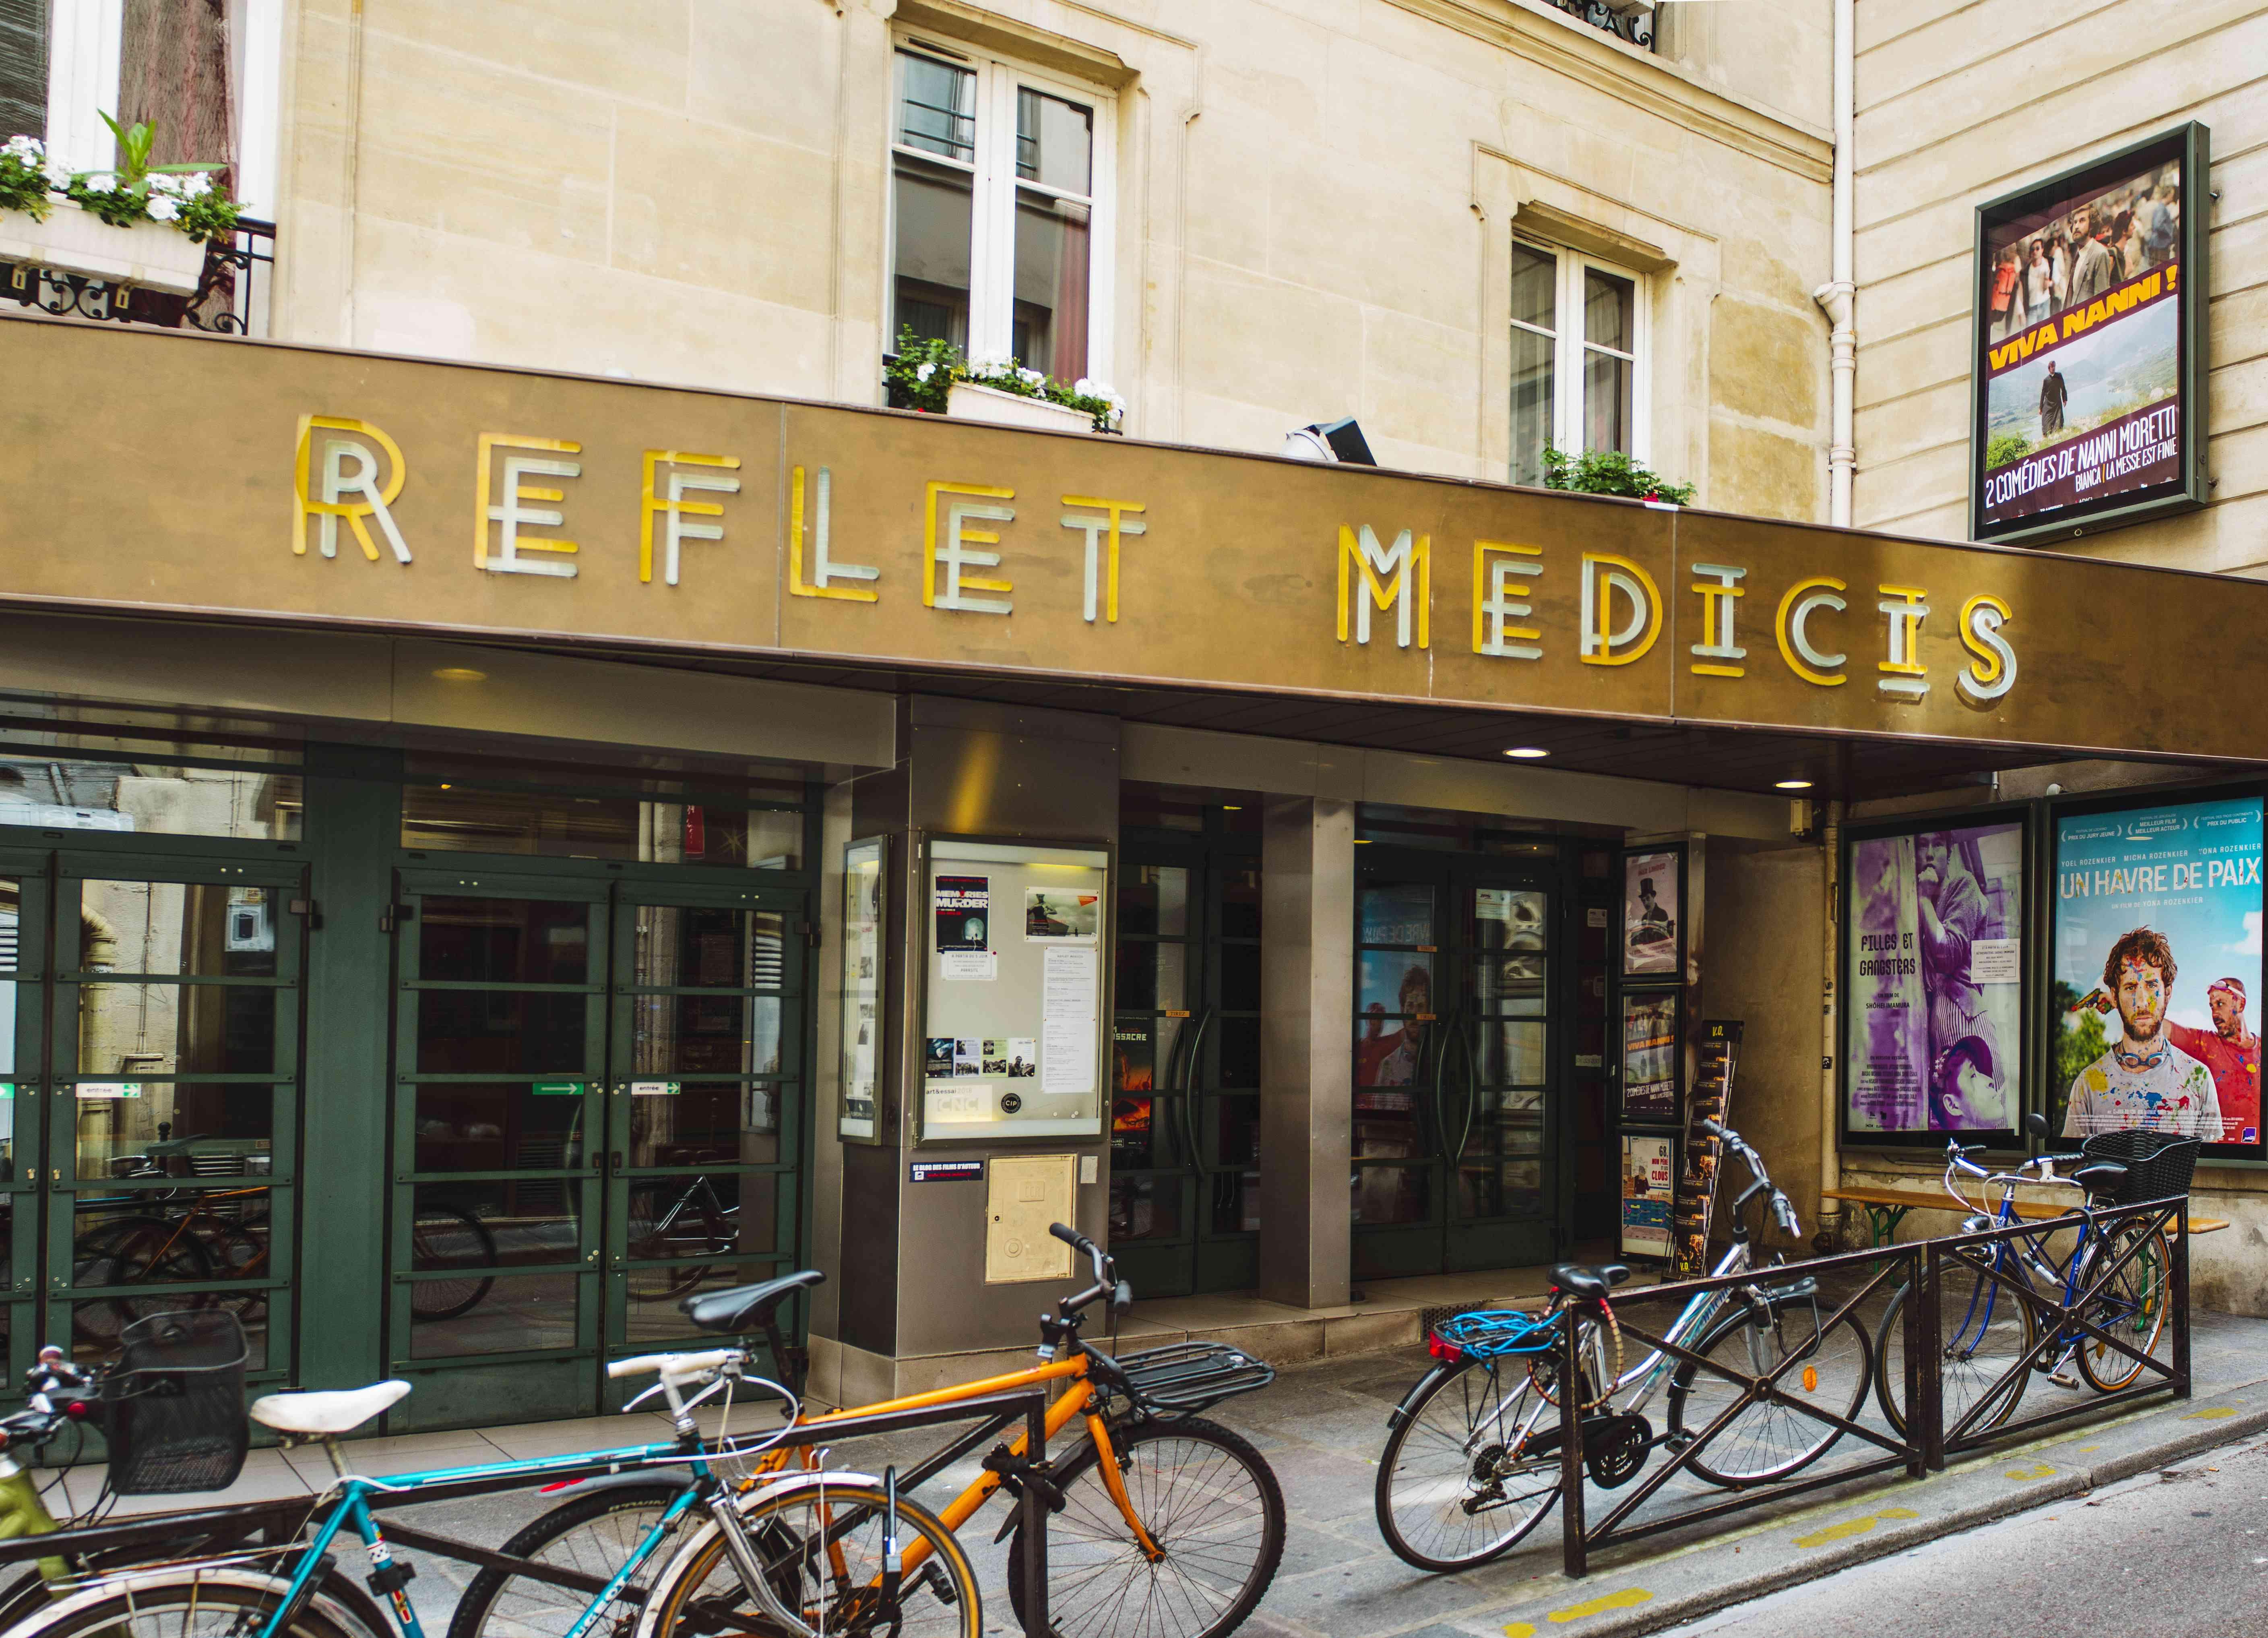 Reflet Medicis Cinema